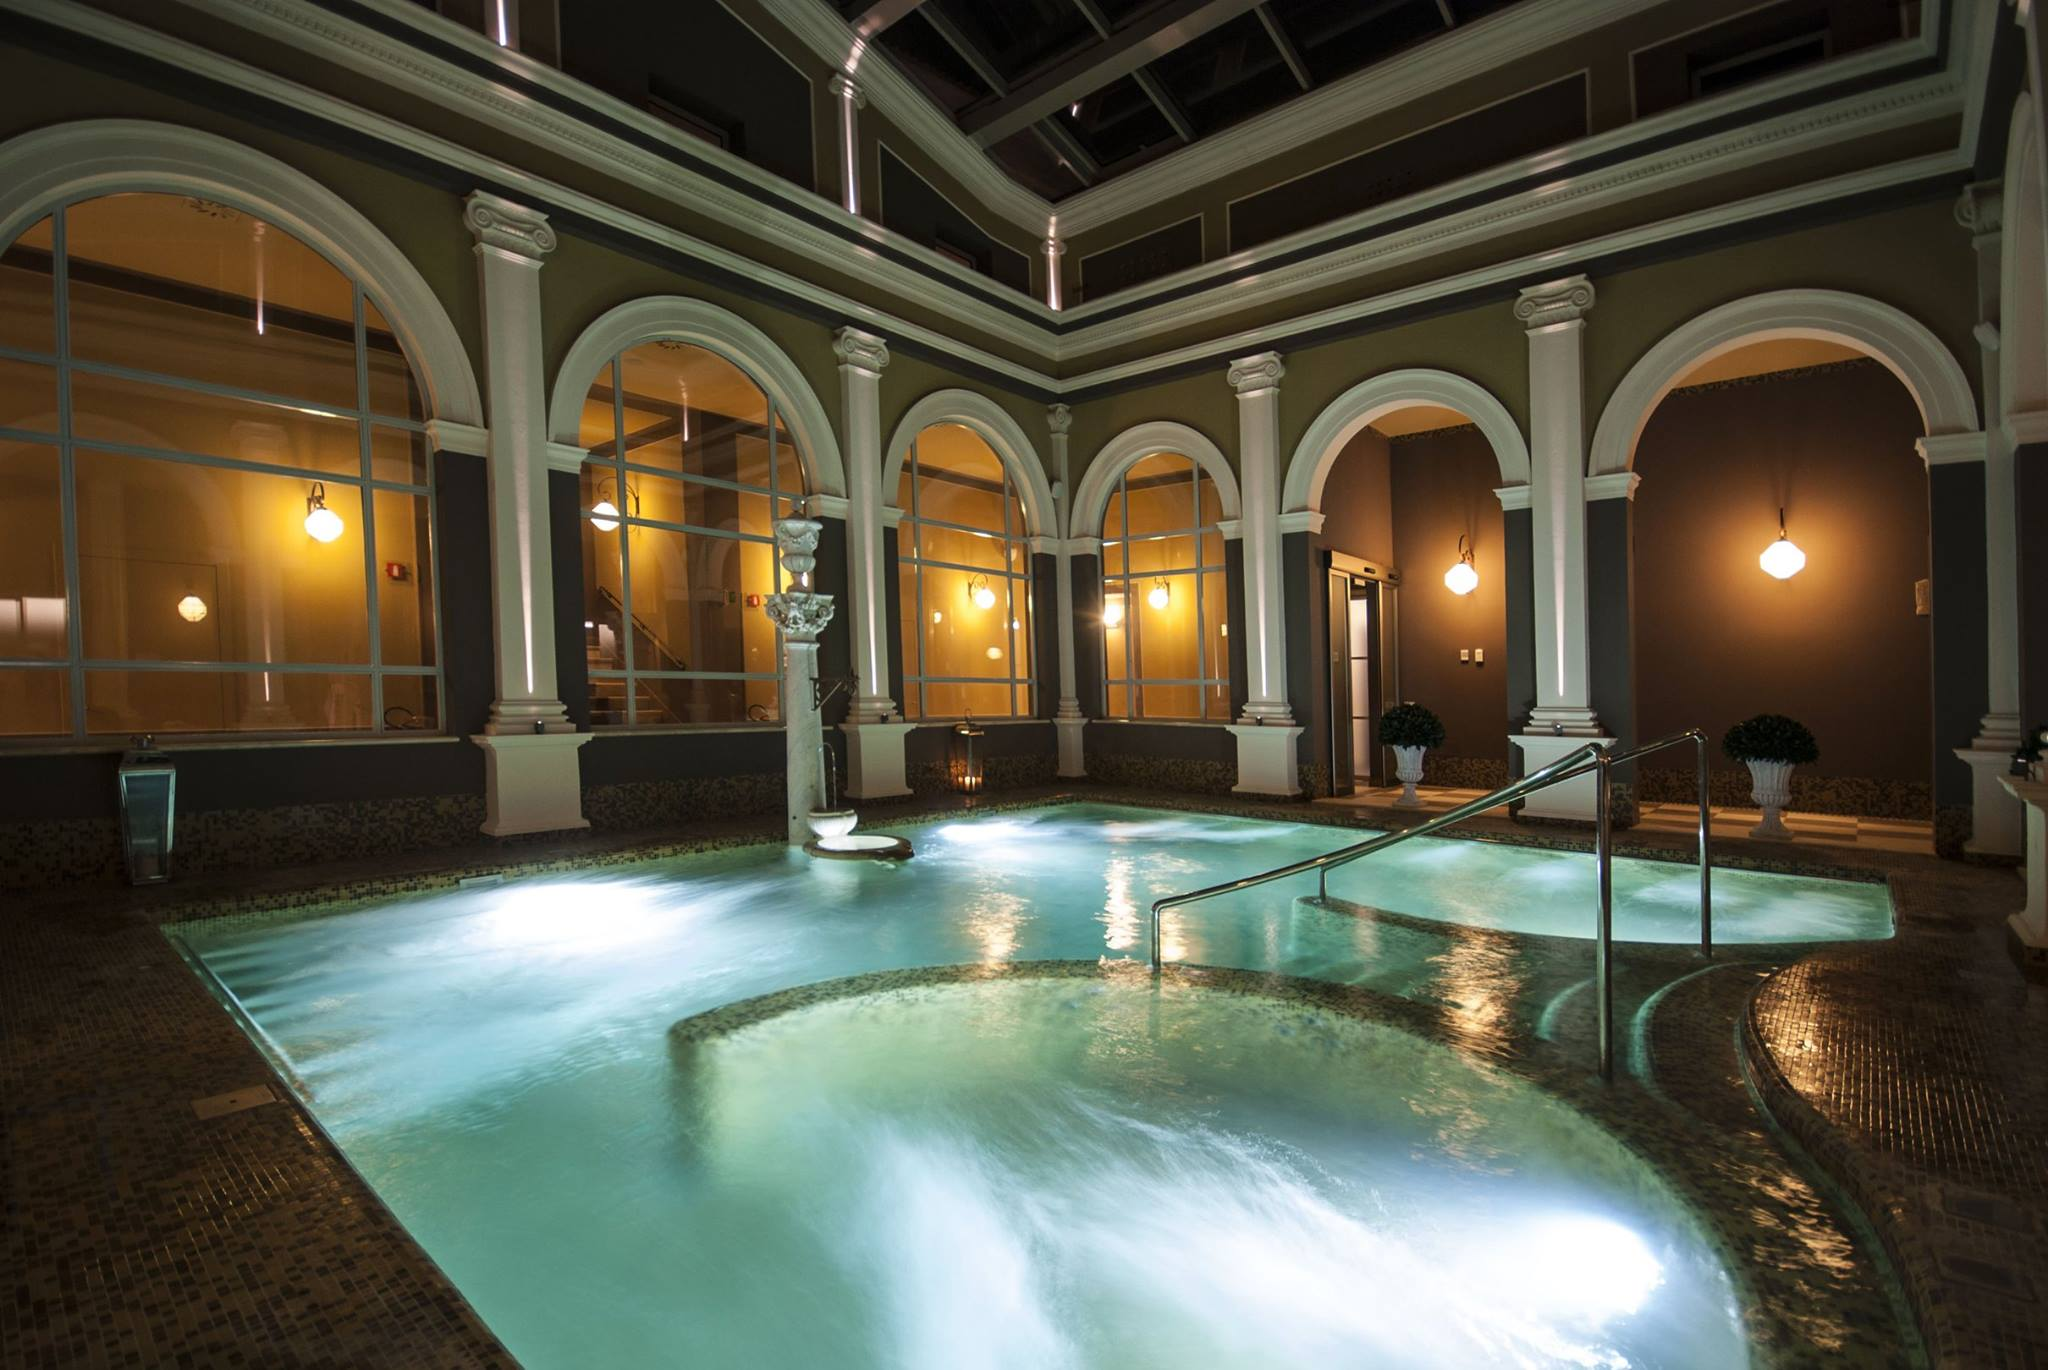 Bagni di pisa terme hotel san giuliano terme pisa toscana - Terme bagni di tivoli orari e prezzi ...